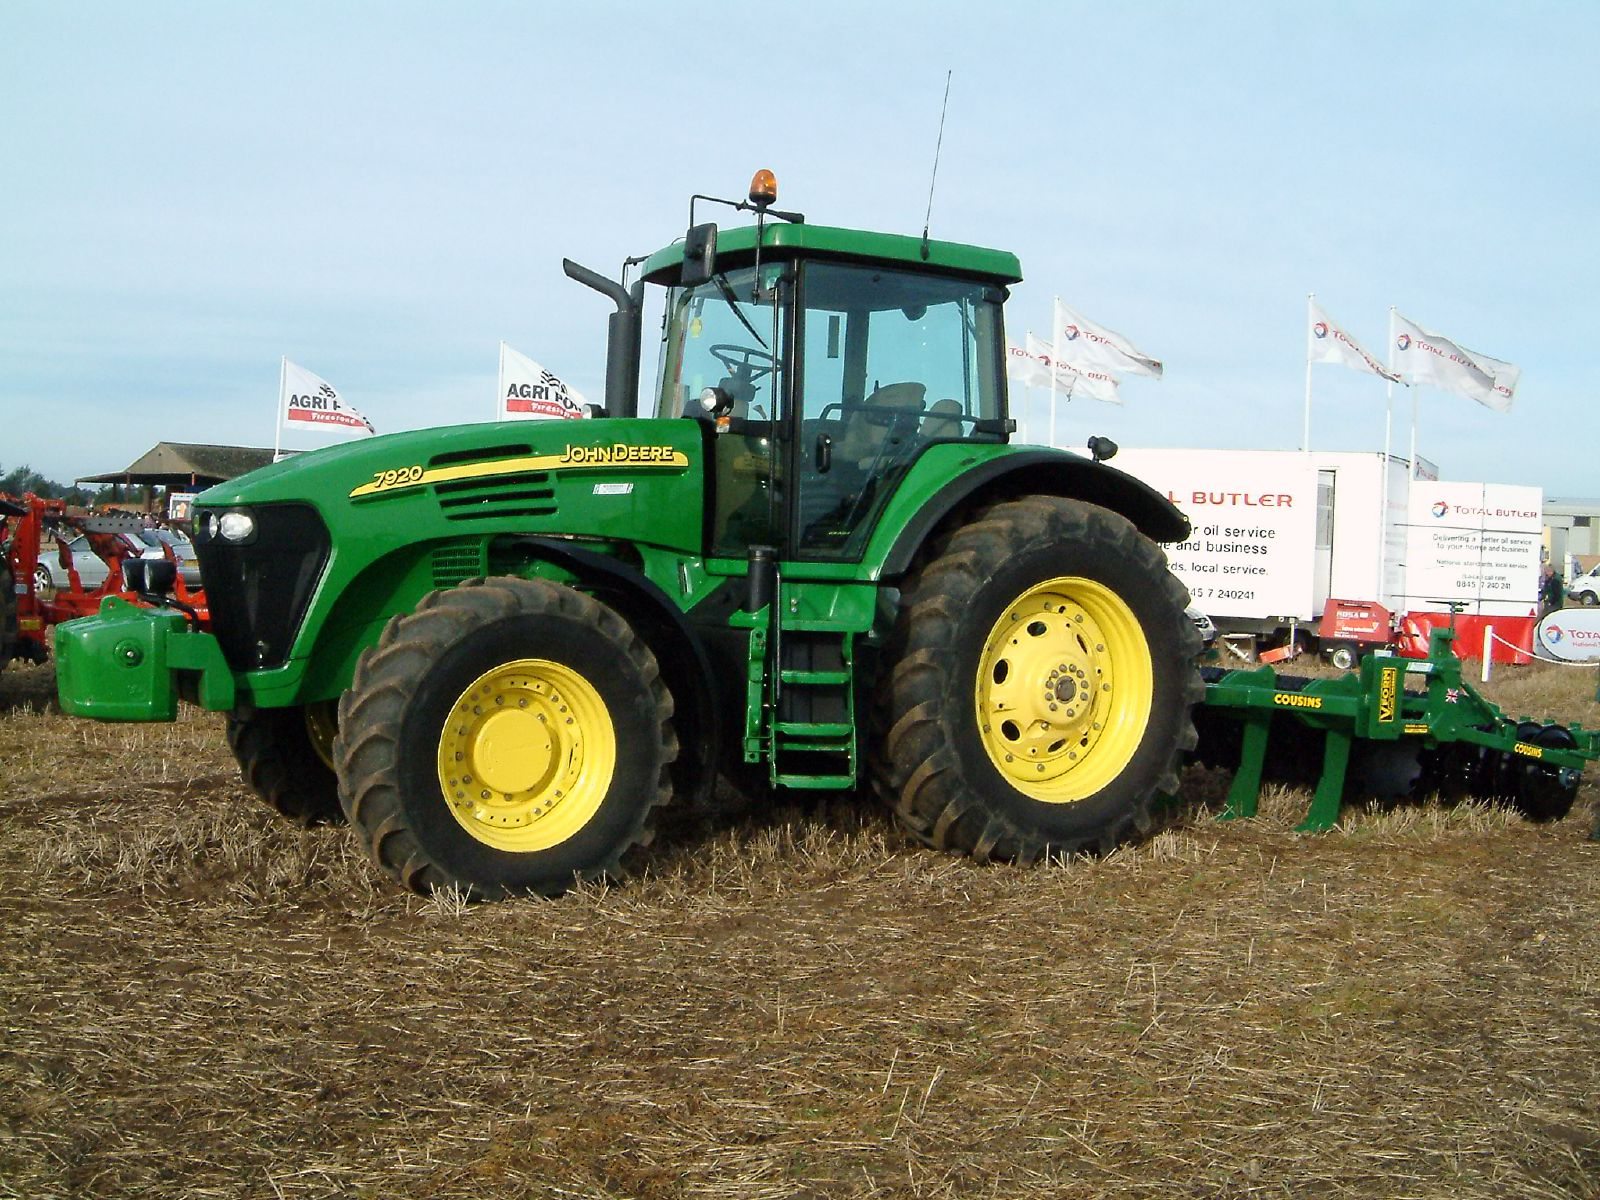 File:John Deere 7920 tractor.jpg